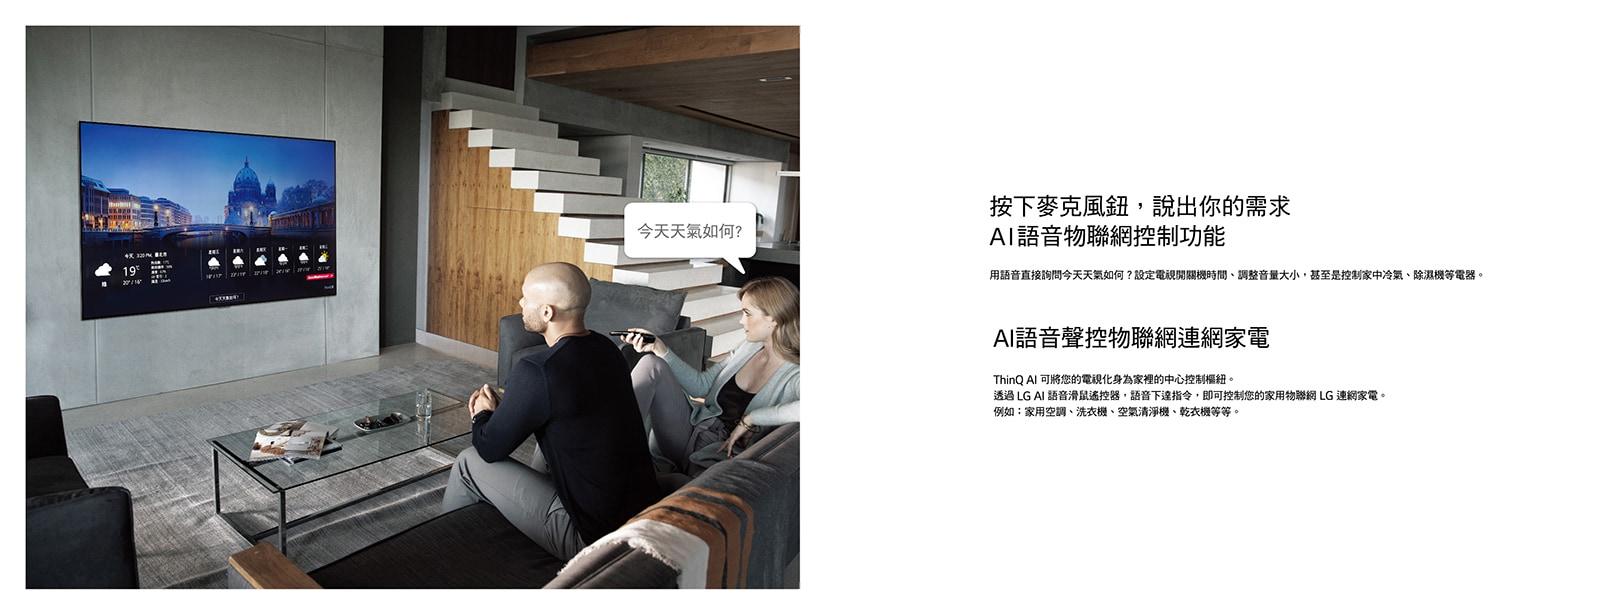 2020-OLED-TV_Leaflet_cover-18_FA_0430_ol_P15-16-D_V4